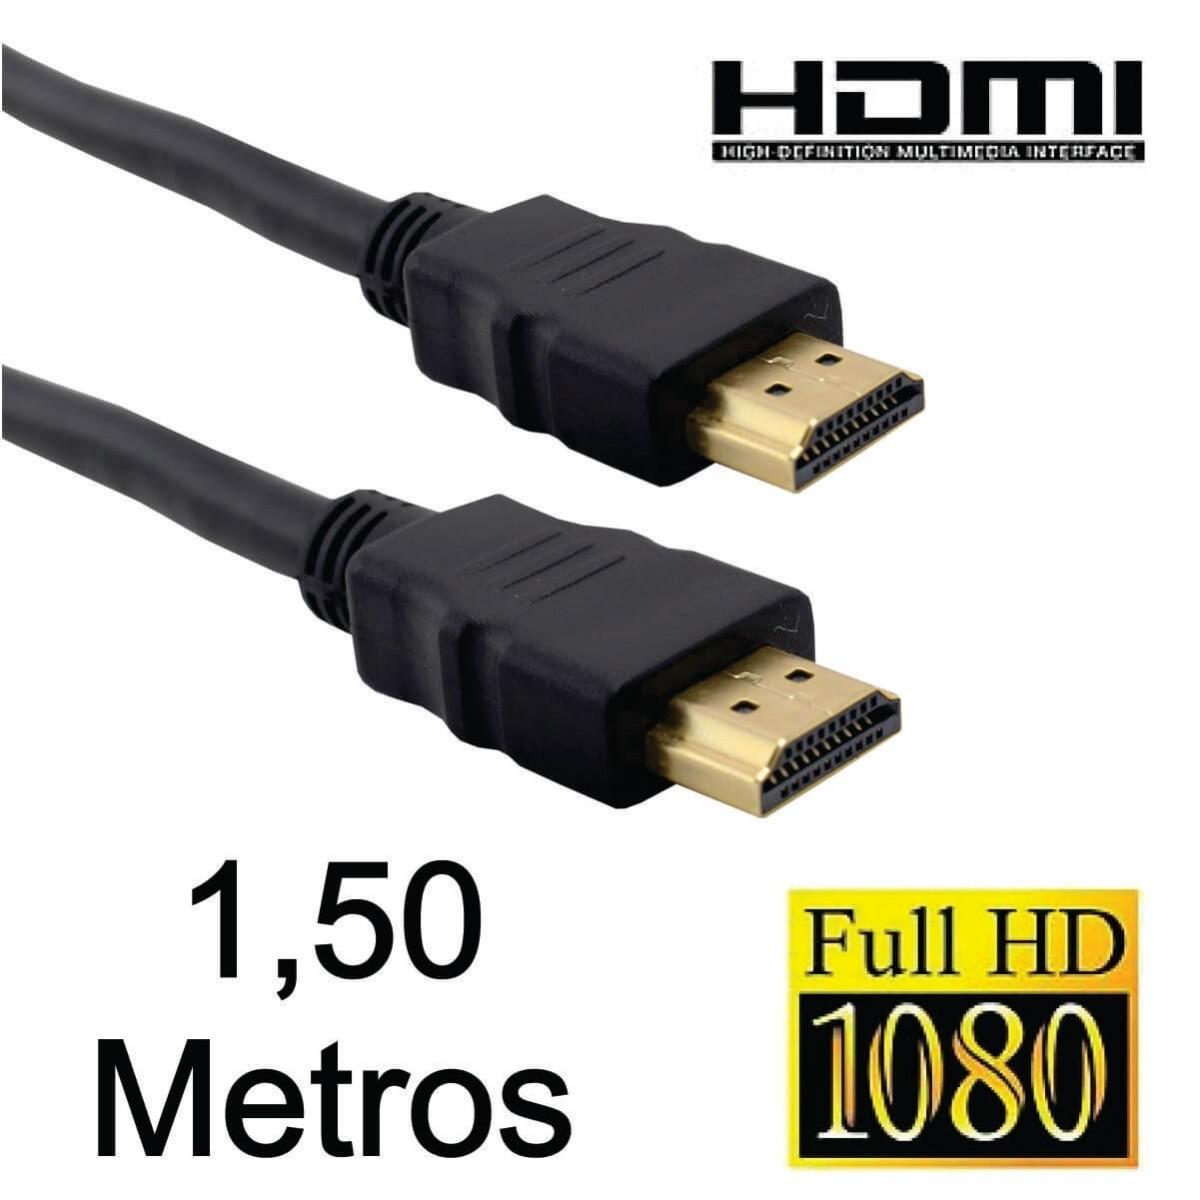 Cabo HDMI 1.4 1,5 Metros Knup KP-H5000 (KP-1.5M)